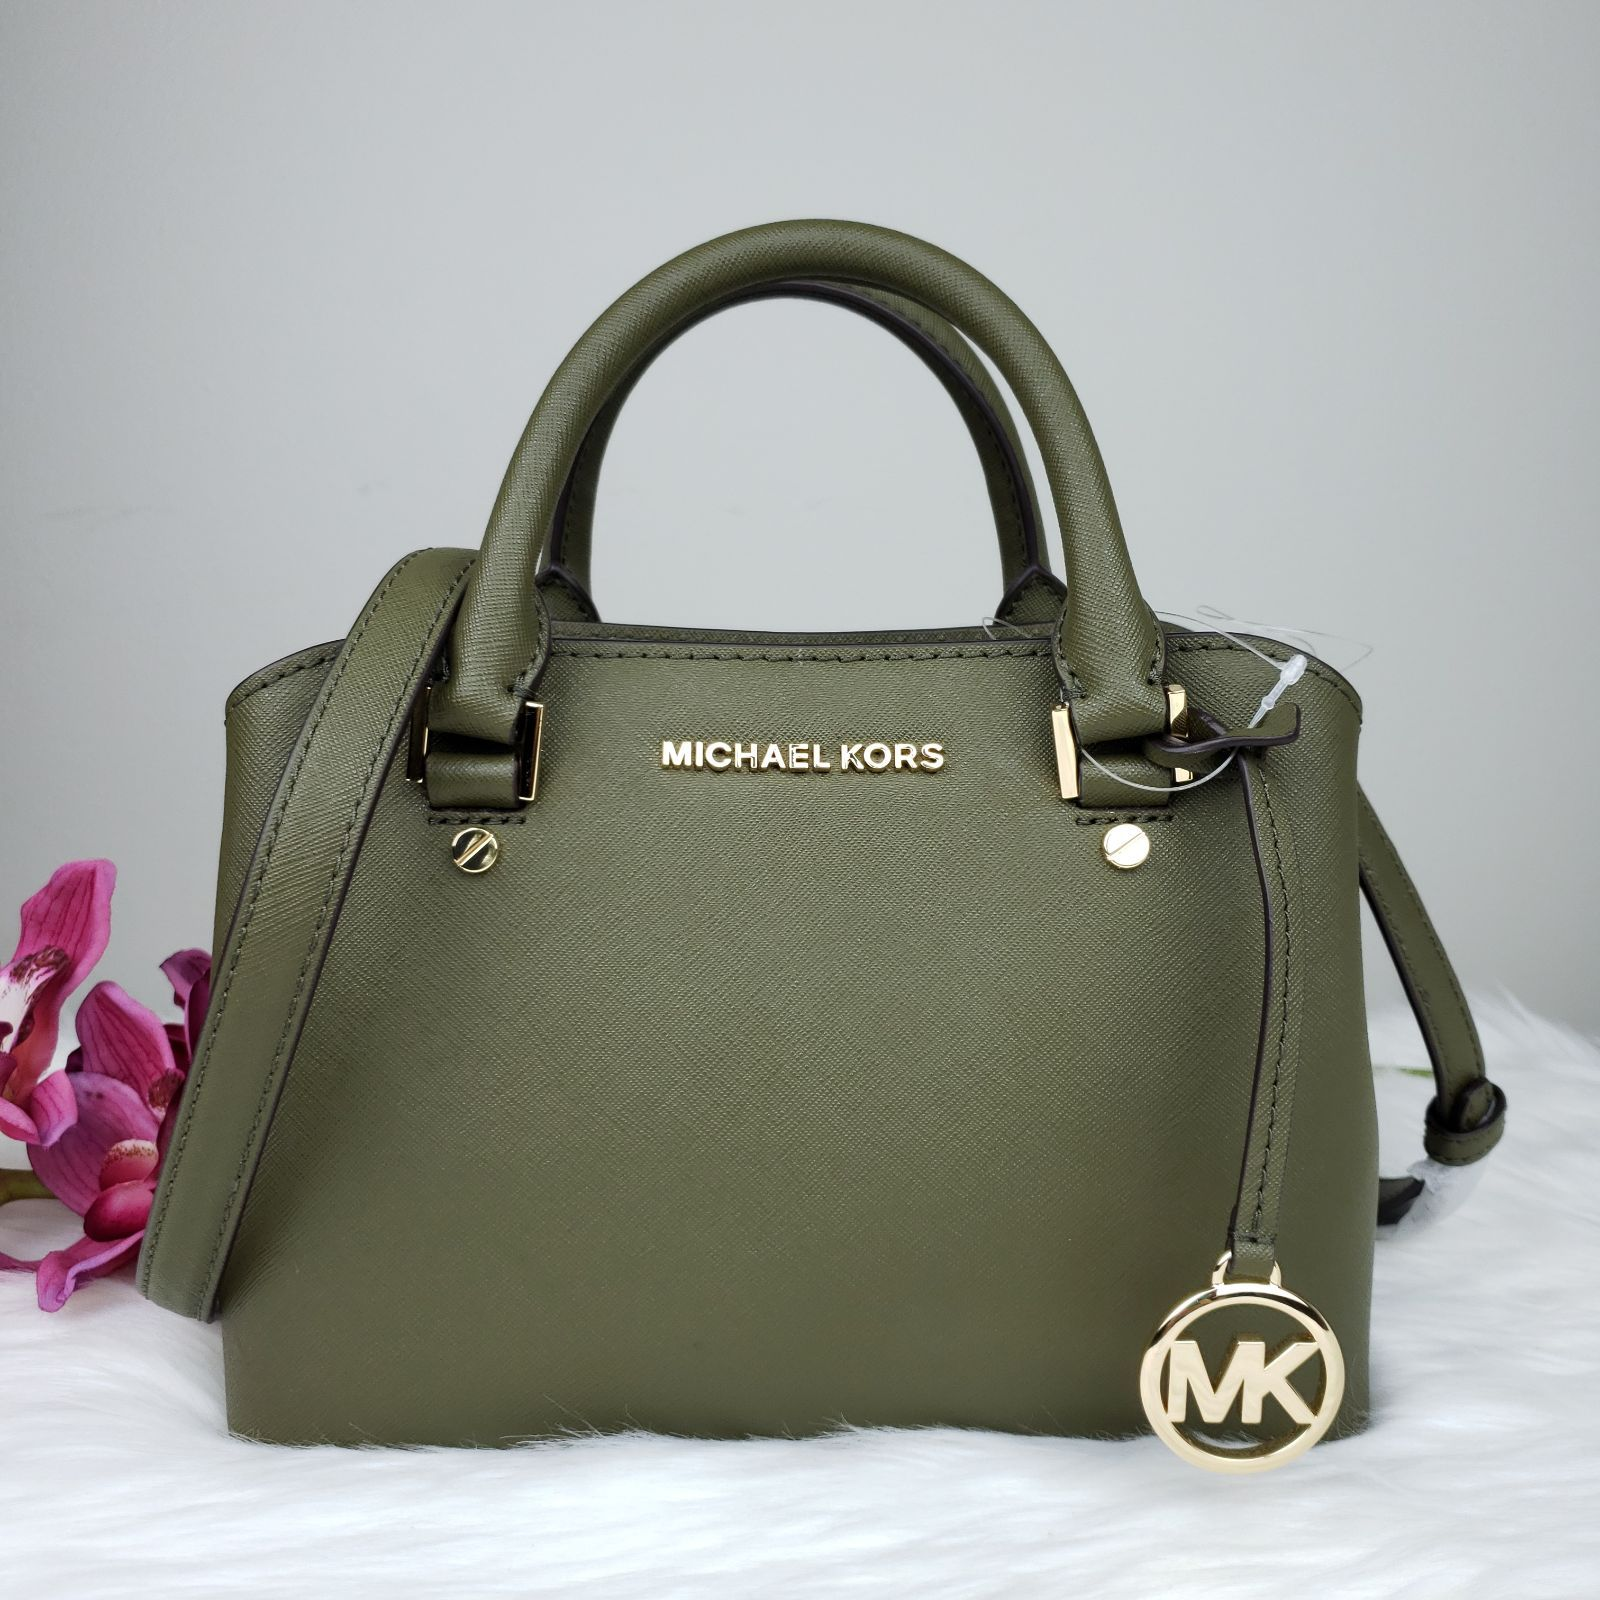 Michael Kors – Savannah model – Bag with adjustable straps